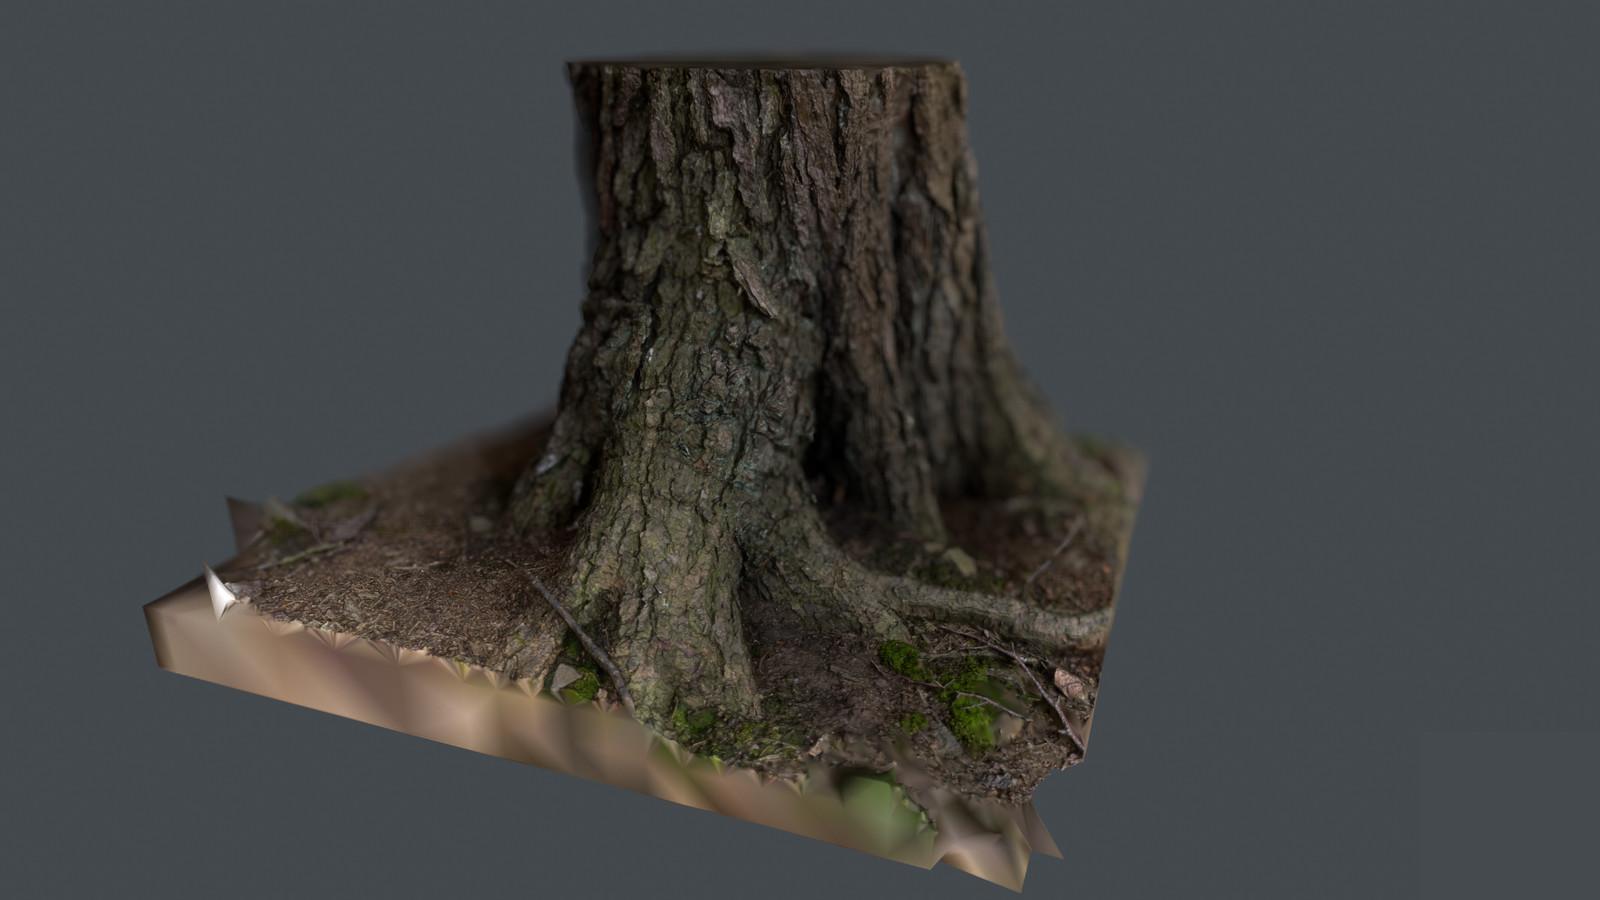 Scanned Pine Tree Trunk